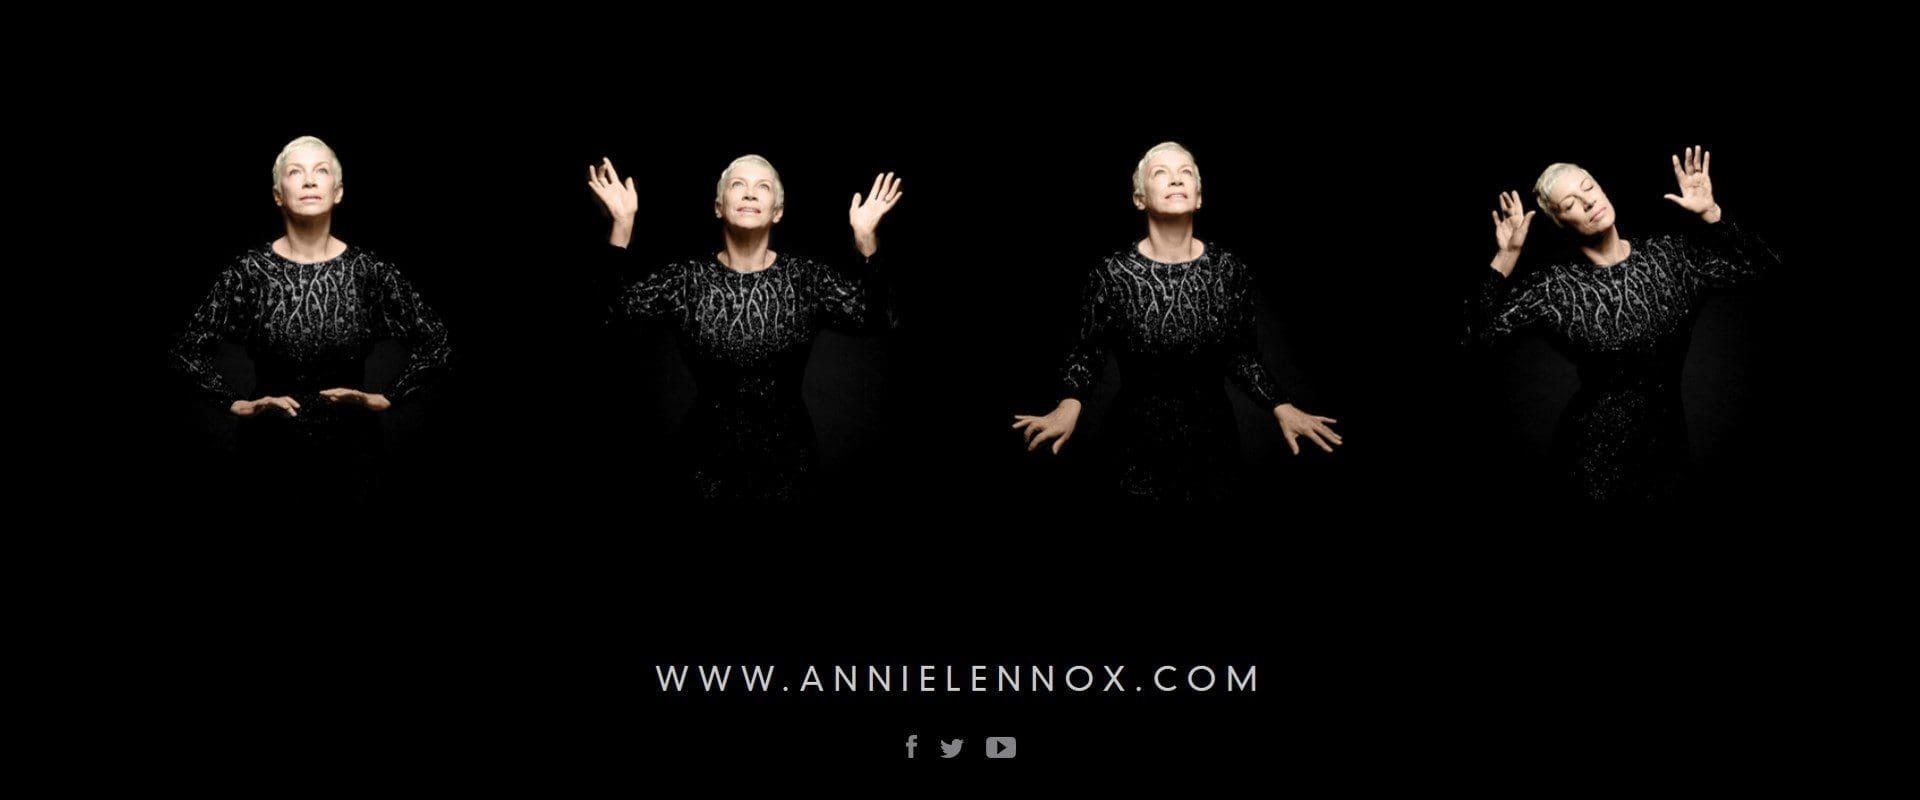 Annie Lennox's new album Nostalgia enter the official UK album chart at No. 9